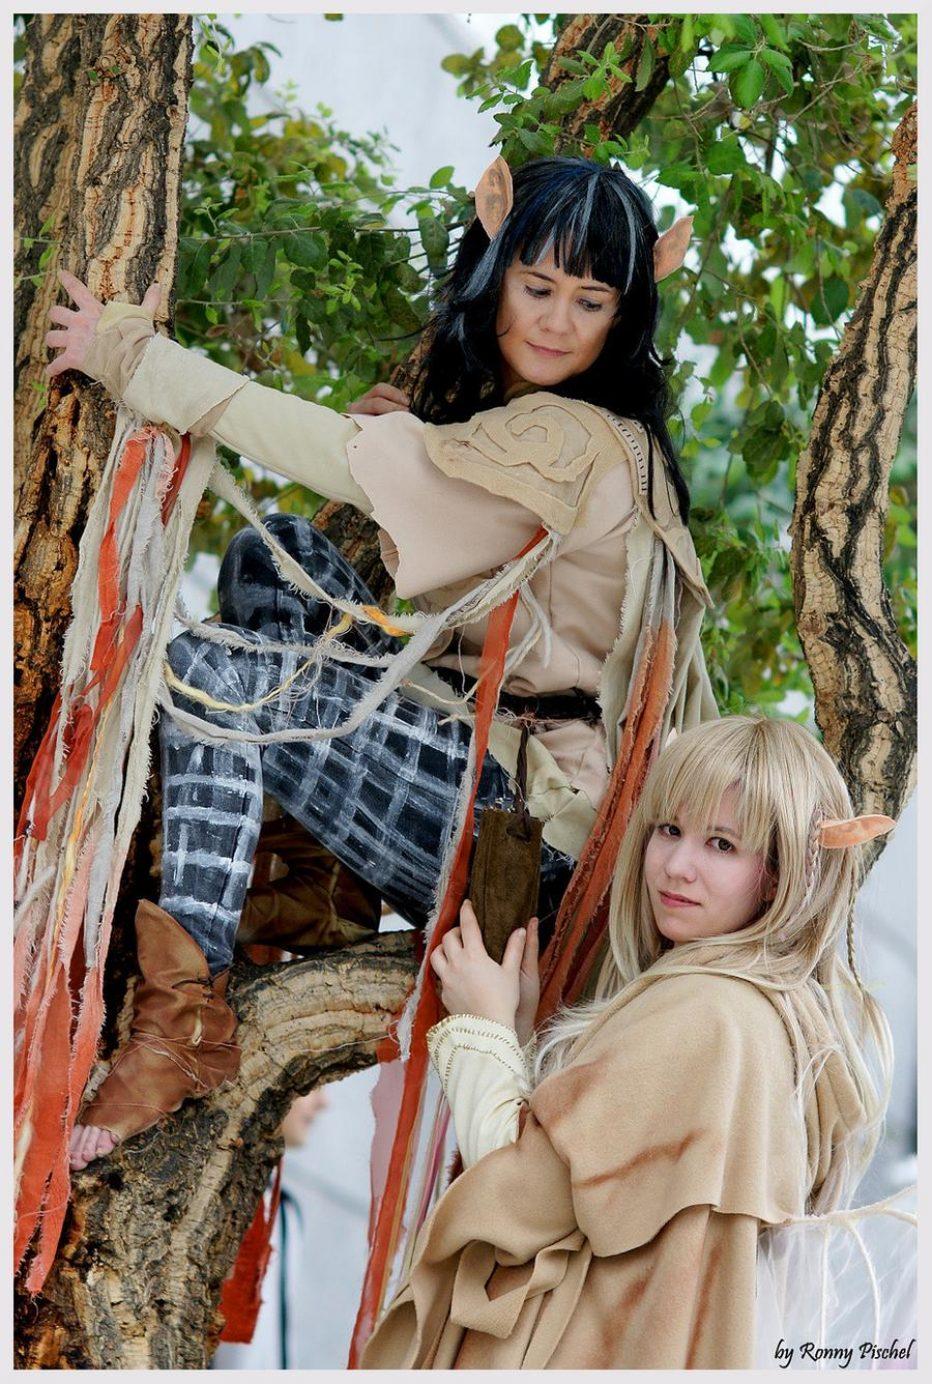 The-Dark-Crystal-Jen-and-Kira-Gamers-Heroes-3.jpg